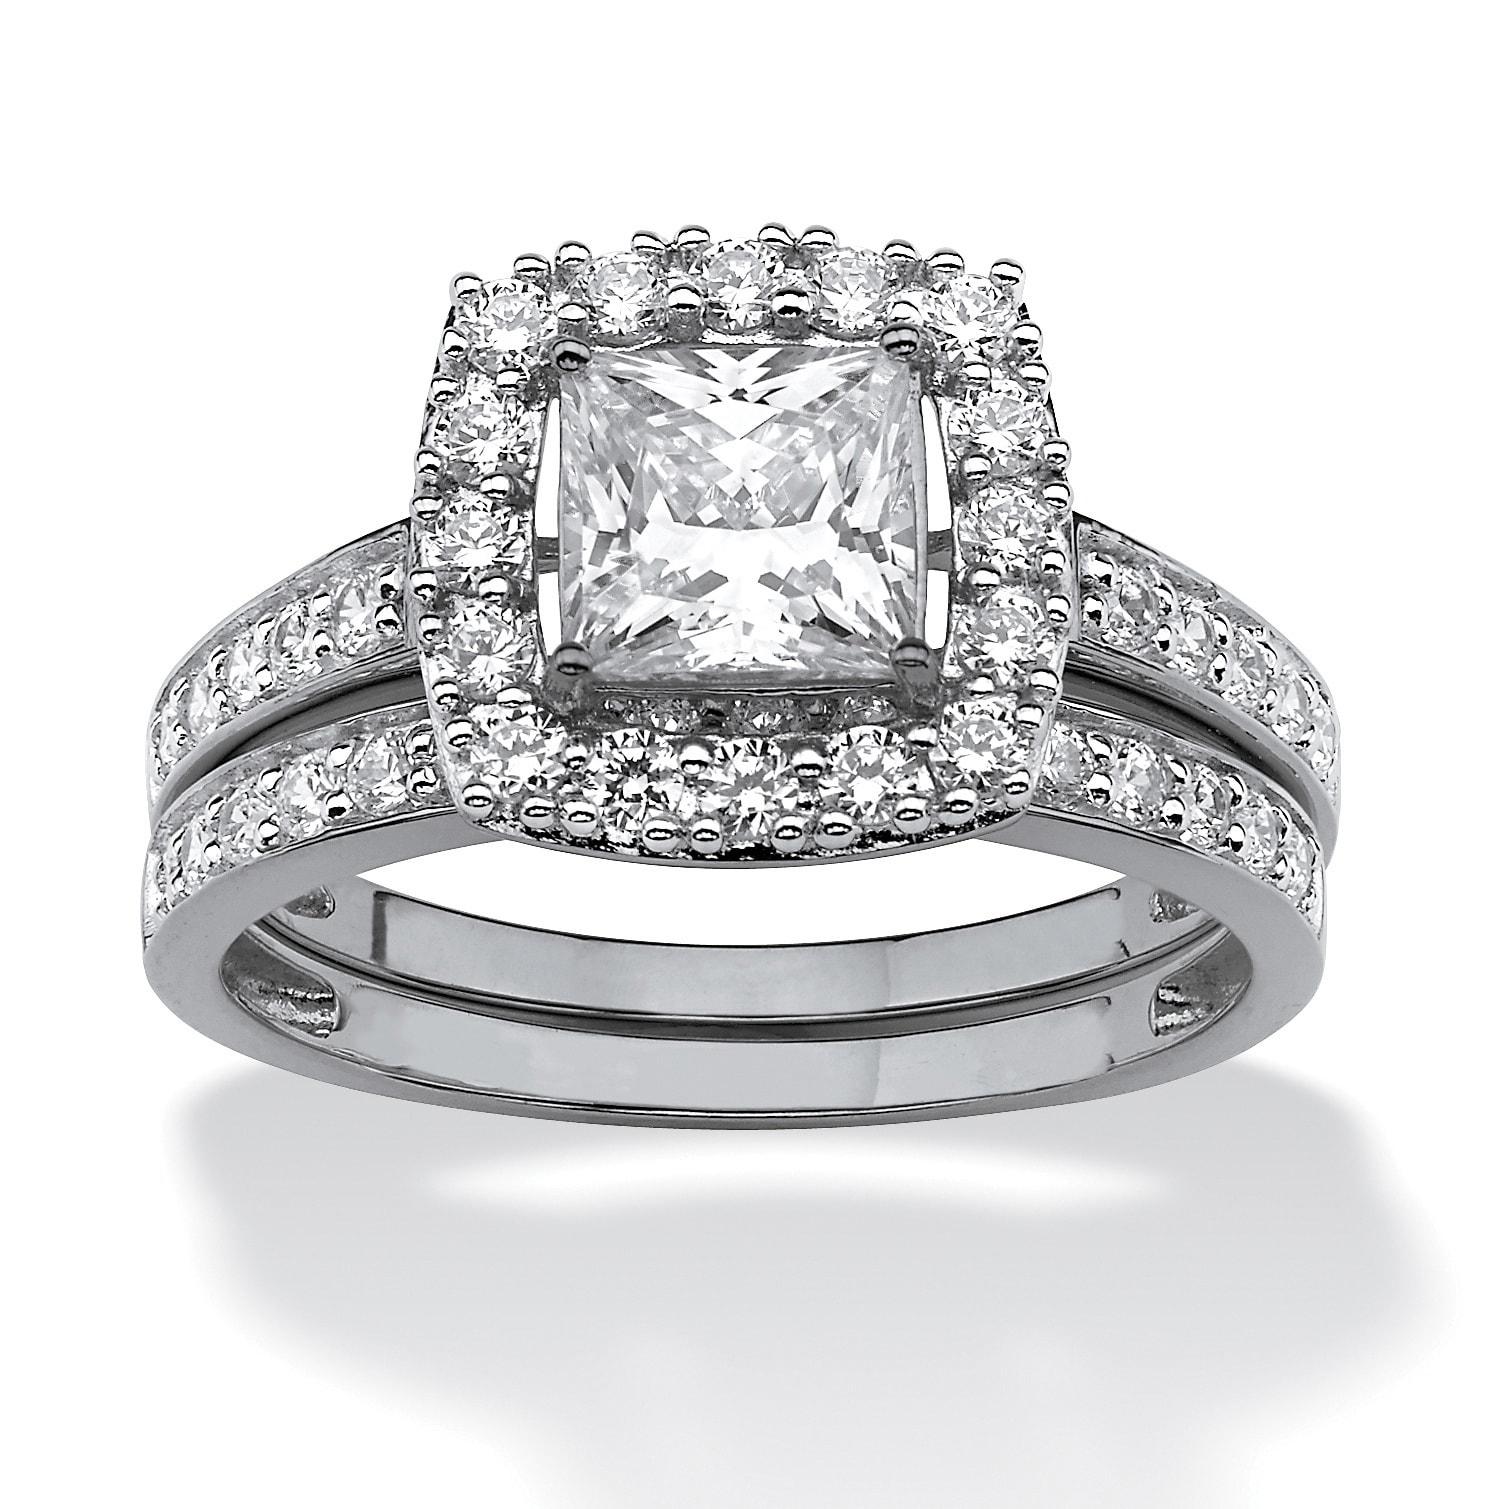 10k White Gold Cubic Zirconia Halo Bridal Ring Set